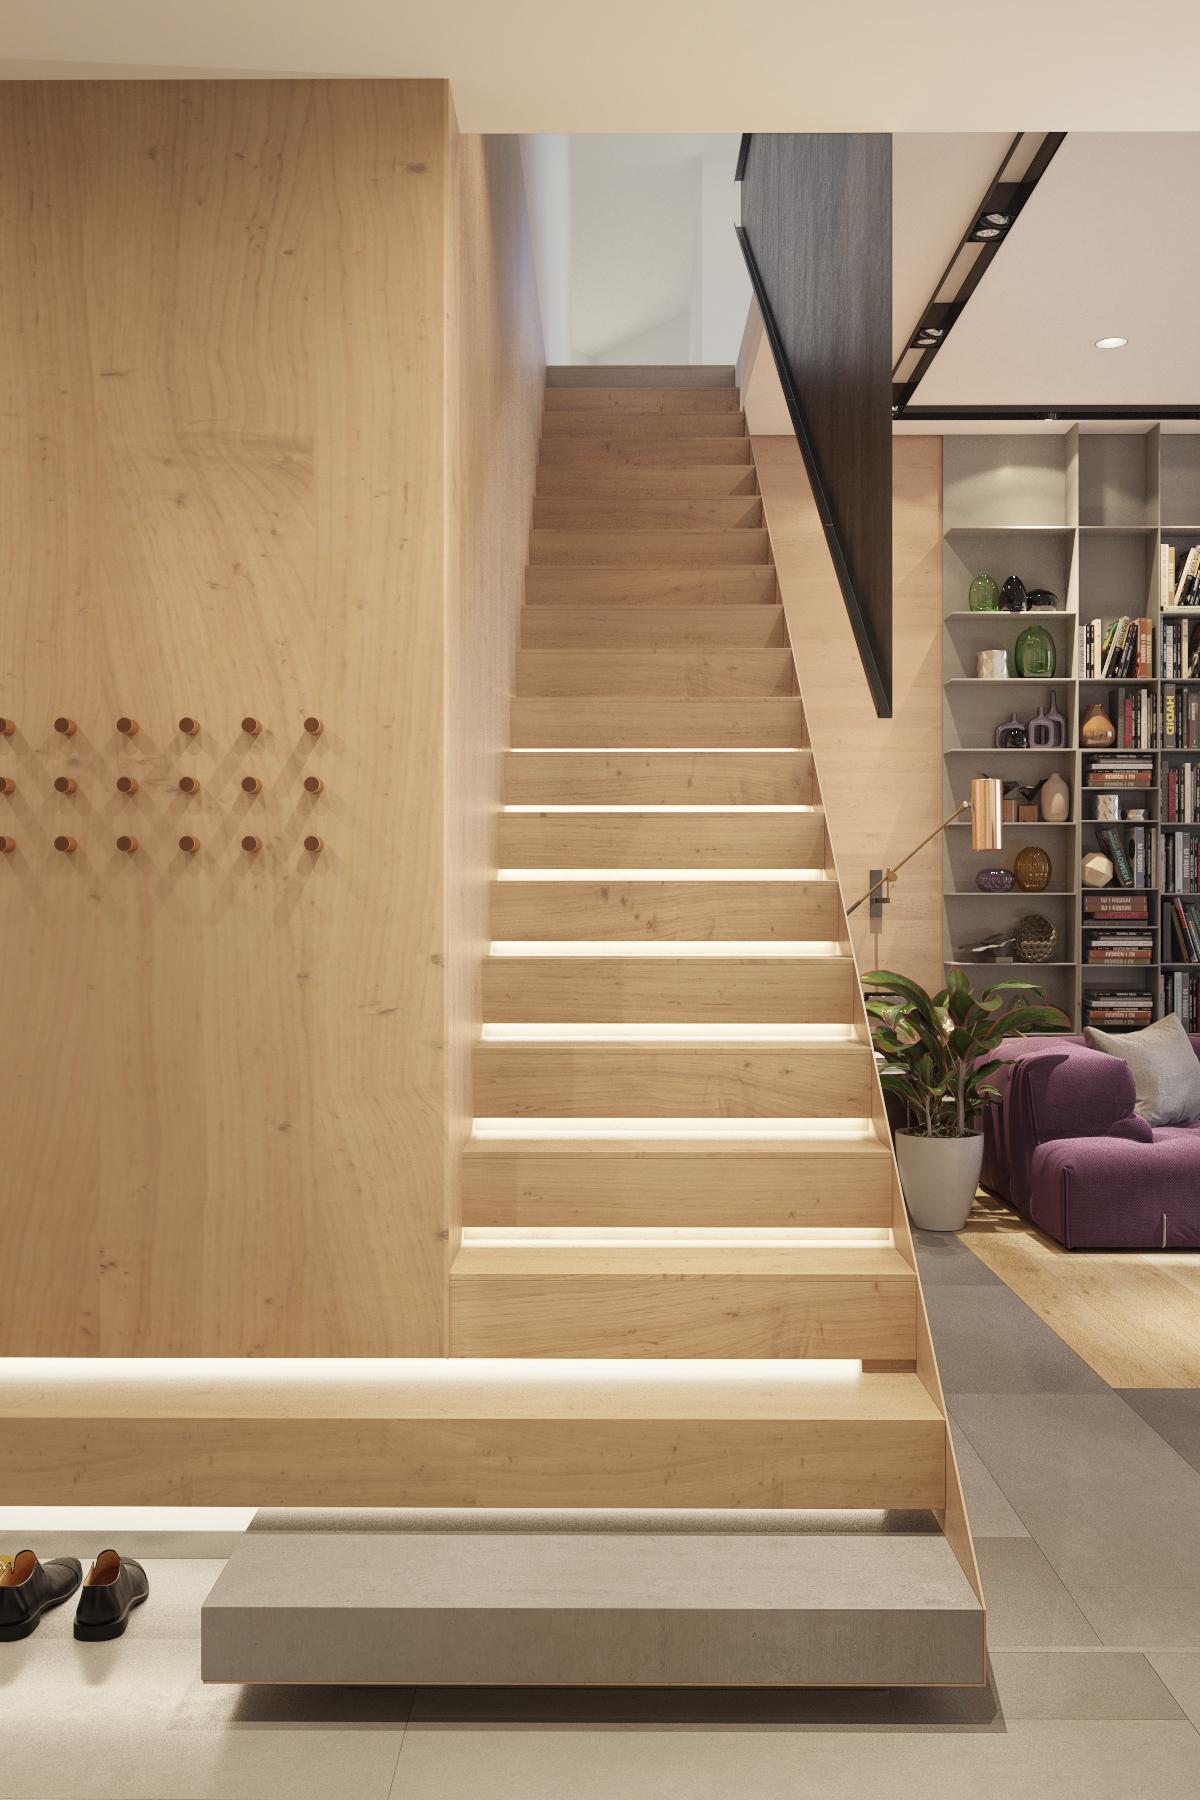 Architecture,Art Direction,Interior Design